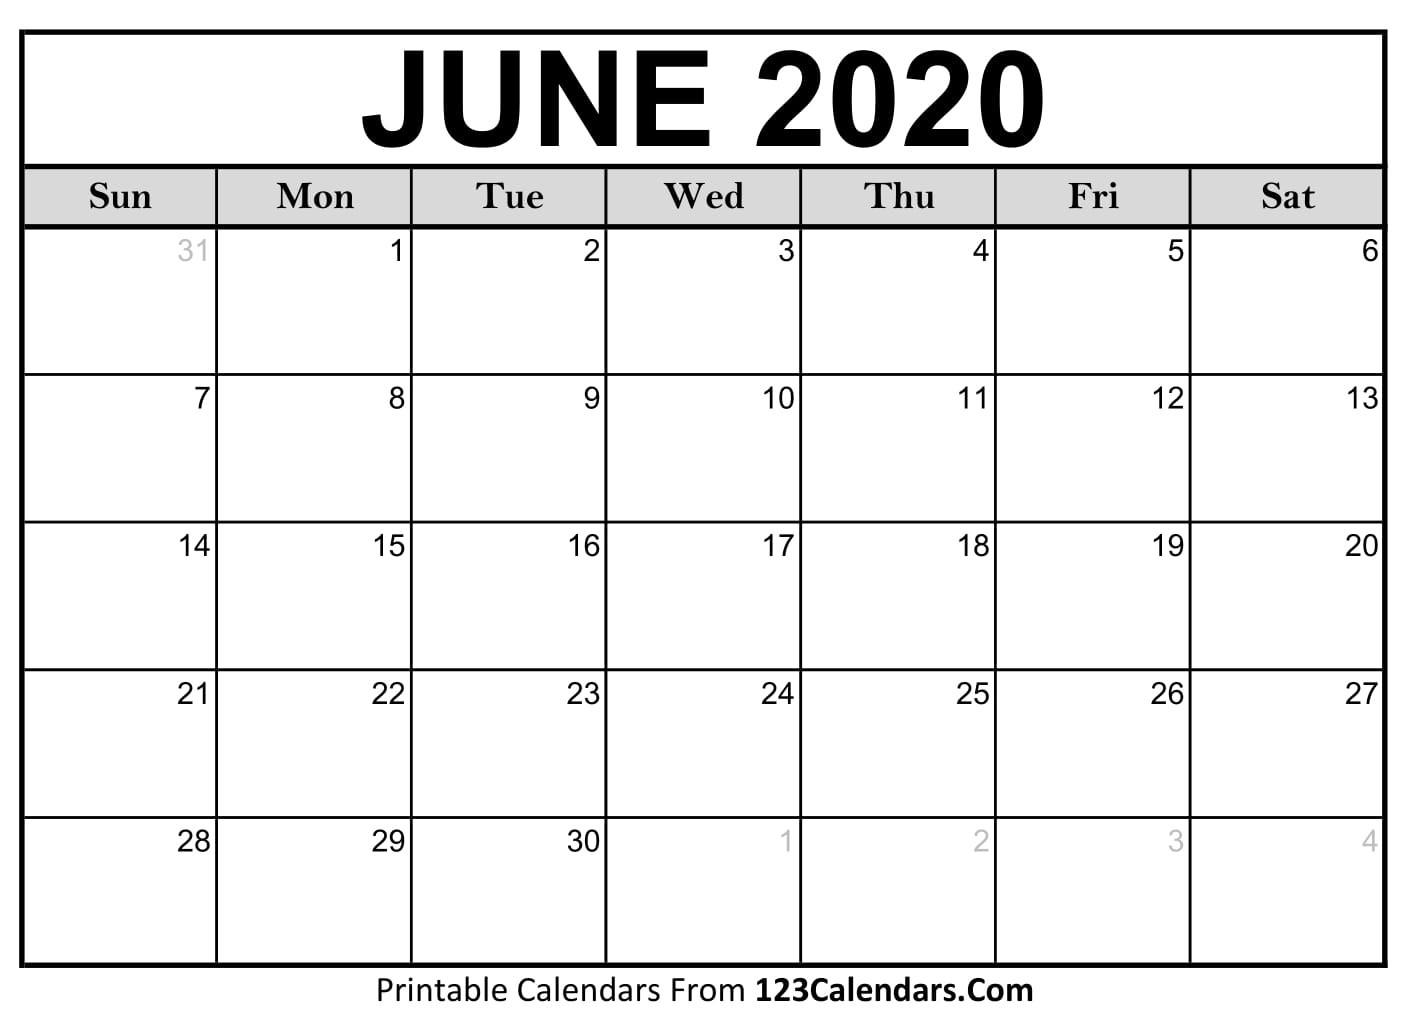 June 2020 Printable Calendar   123Calendars-Printable Calendar 2020 Monthly June And July